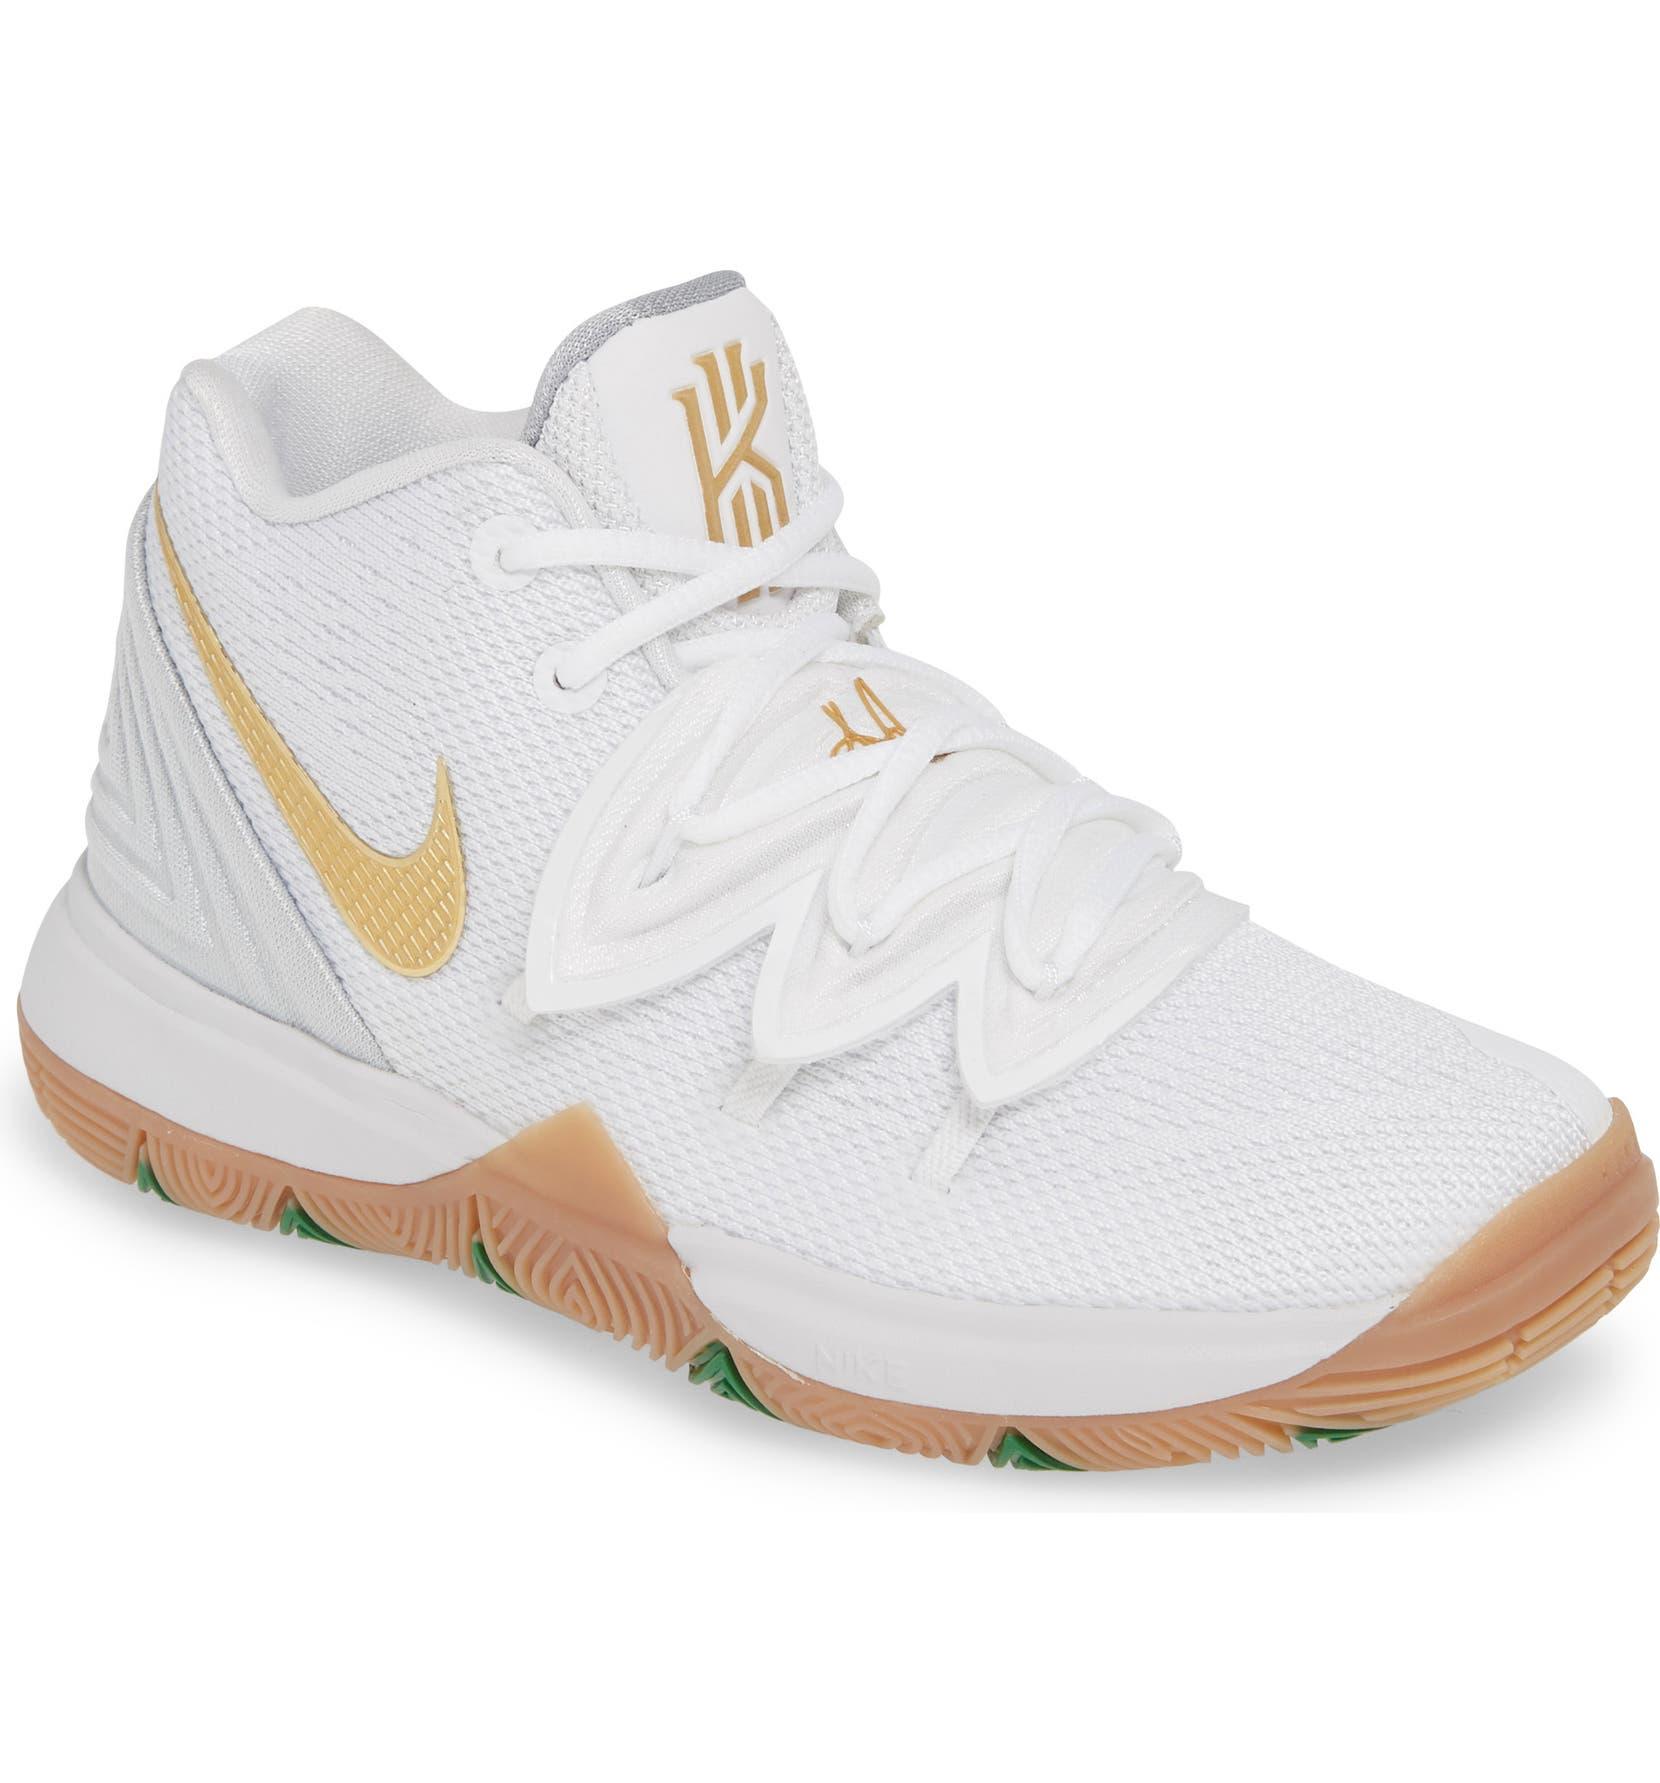 best service b75c7 f72d7 Kyrie 5 Basketball Shoe